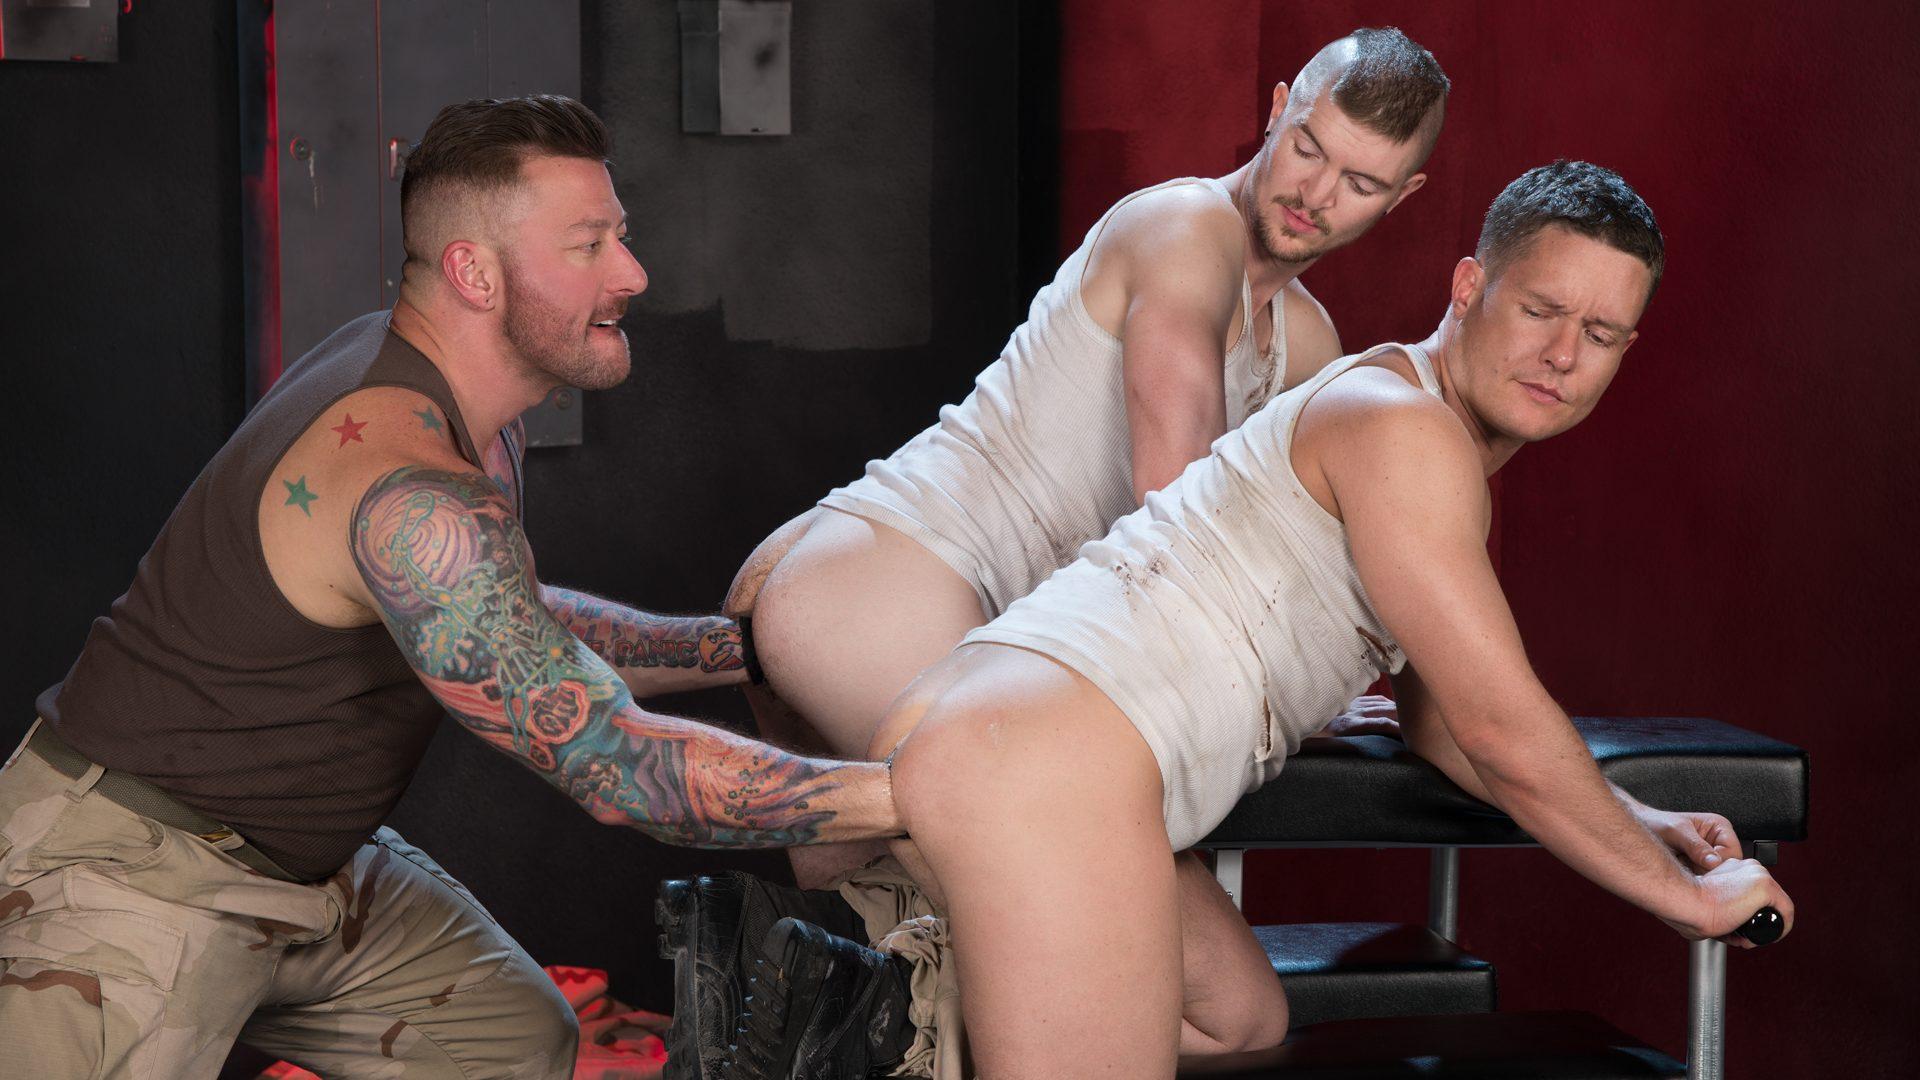 Full Fist Interrogation - Scene 3 1